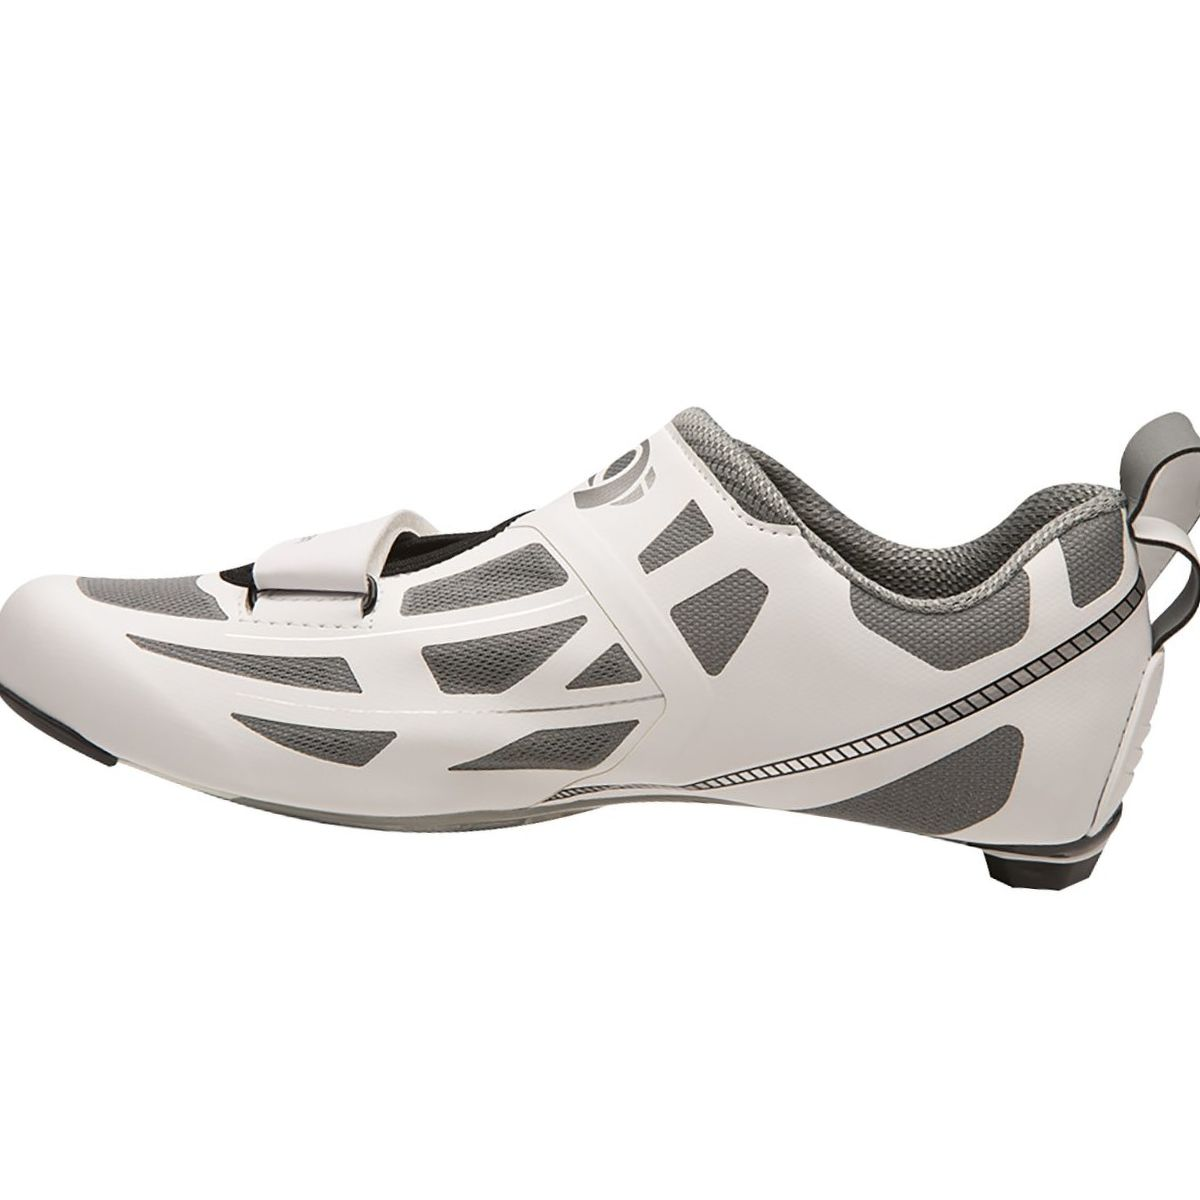 Pearl Izumi Tri Fly Elite V6 Cycling Shoe - Women's